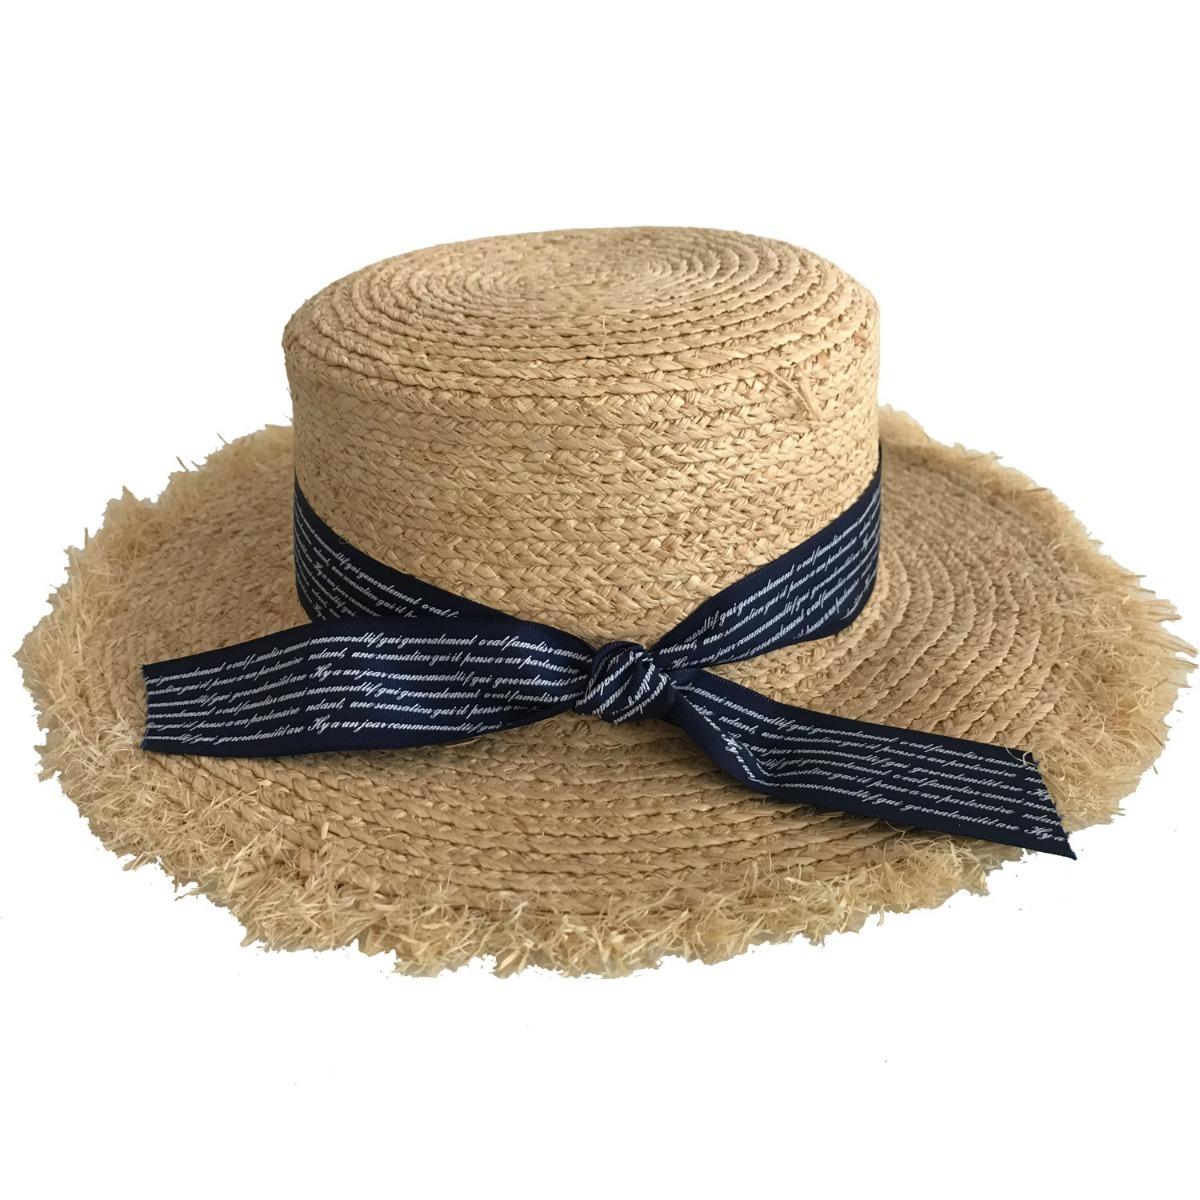 Sombrero Canotier Rafia Defle Compañia De Sombreros 86461115 ... ce5e3229af7